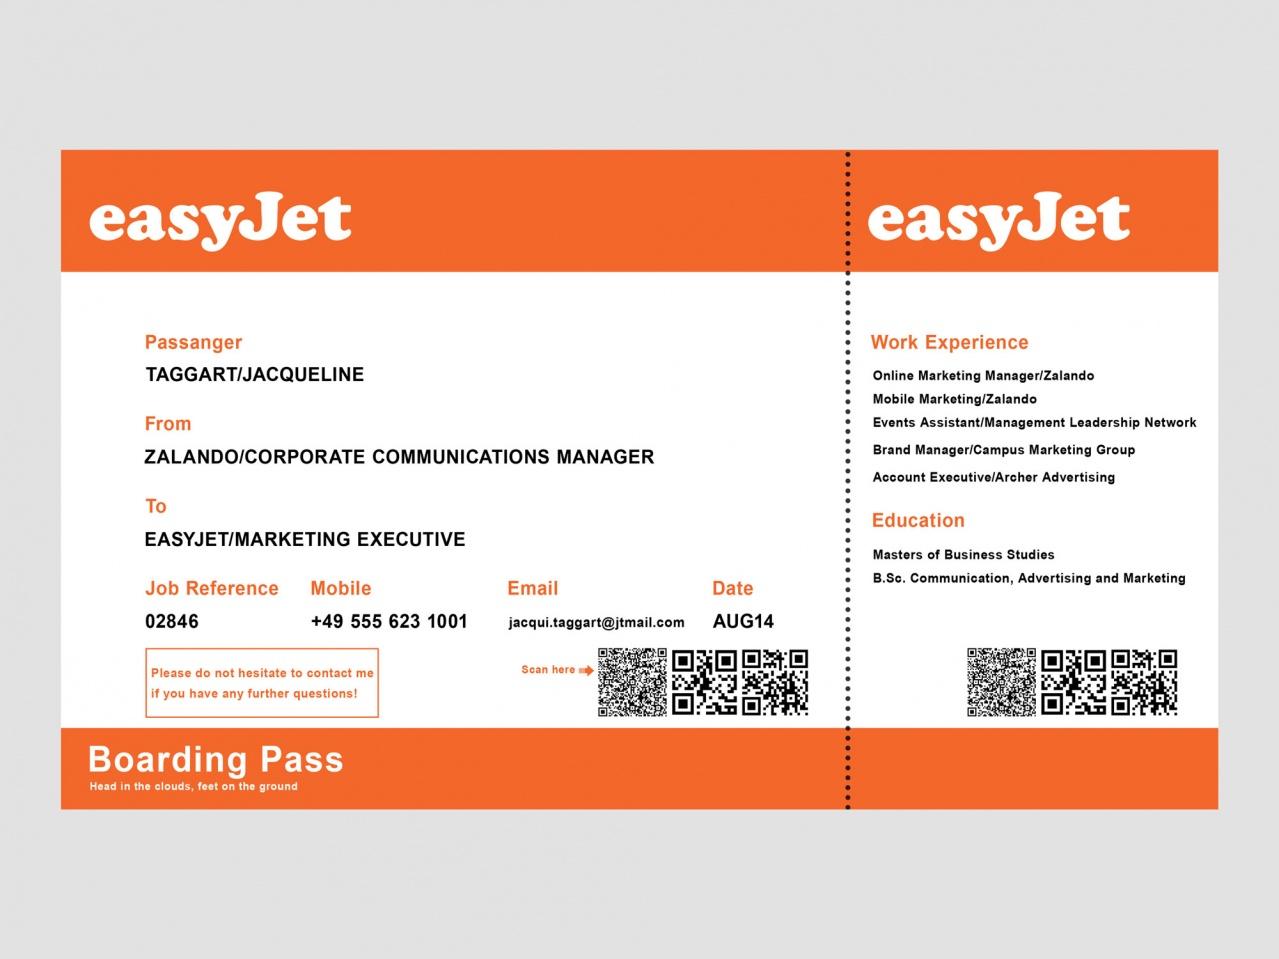 easyjet marketing